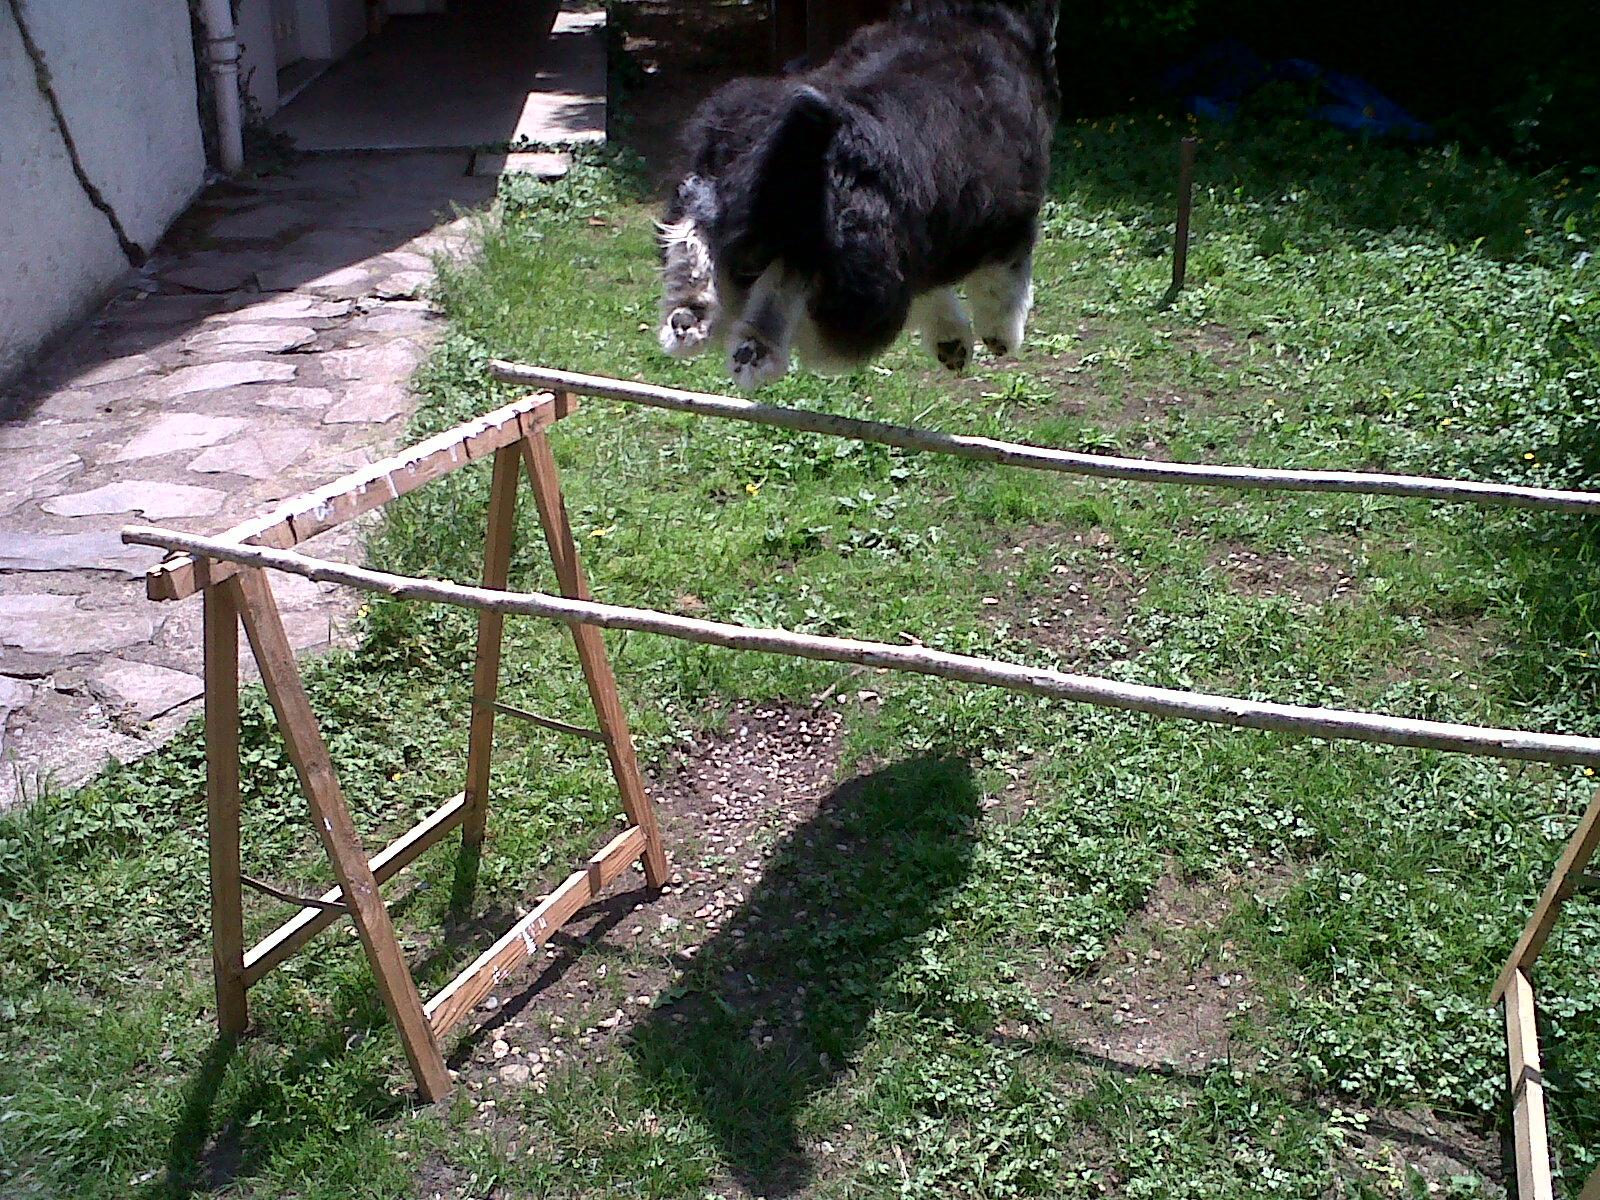 Agility au jardin ma chienne l 39 preuve audrey for Agility au jardin